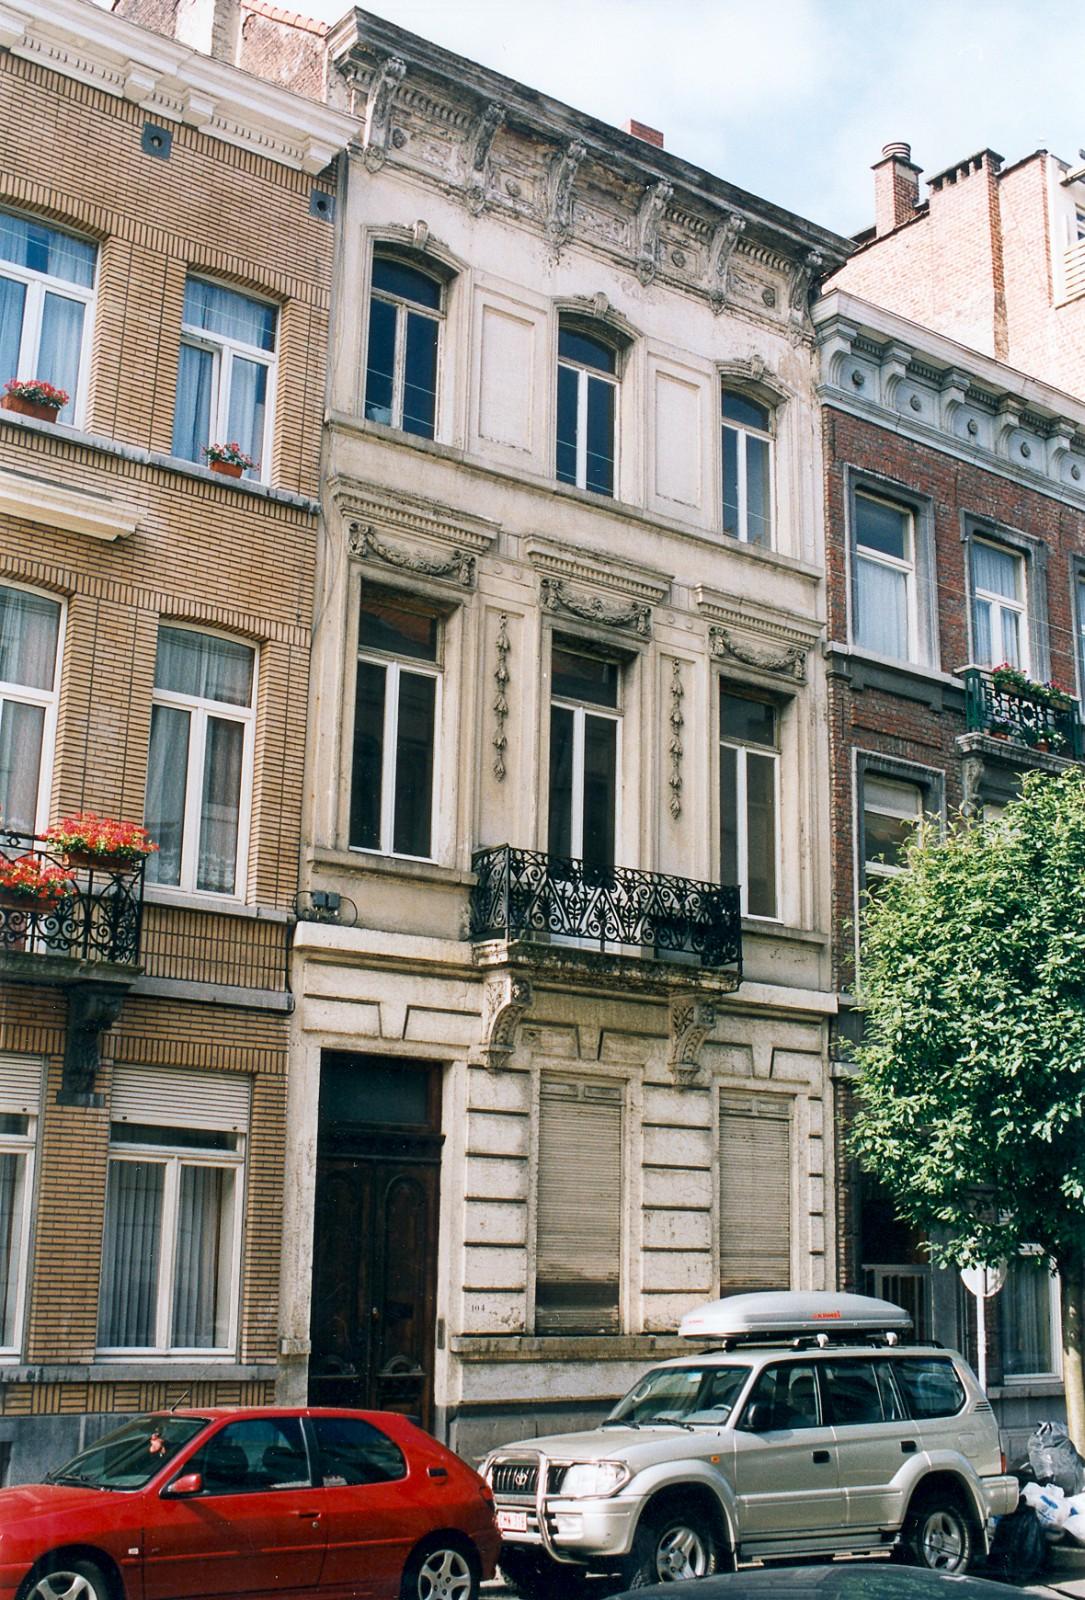 Rue Berckmans 104., 2003